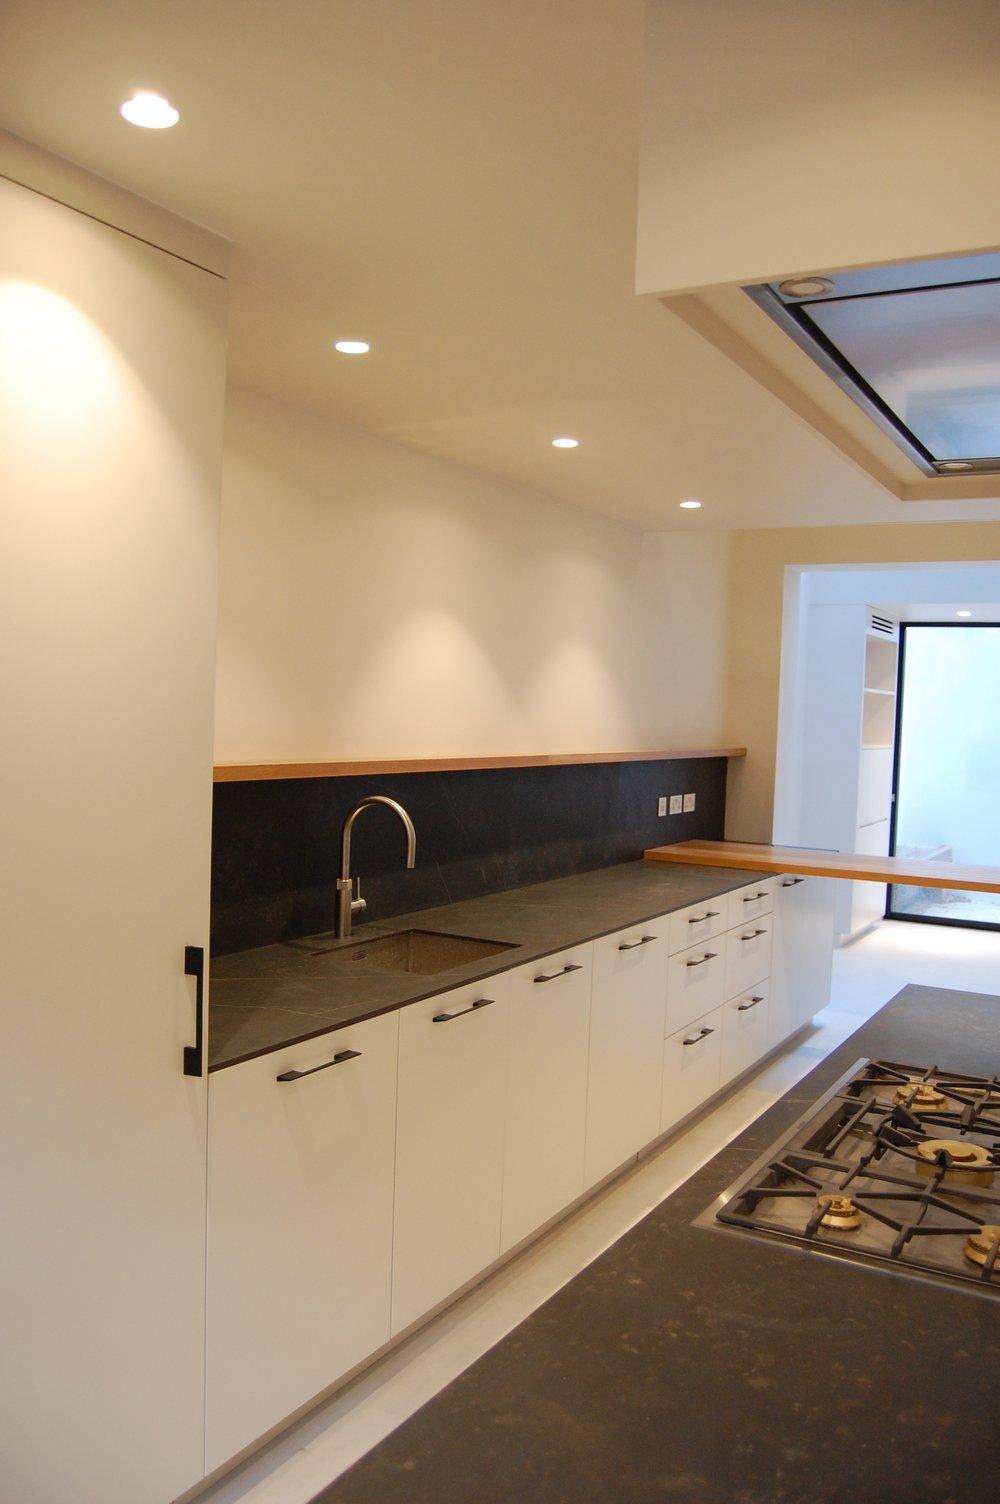 Grain_Bespoke_Furniture_Chelsea_Kitchen_5.jpg